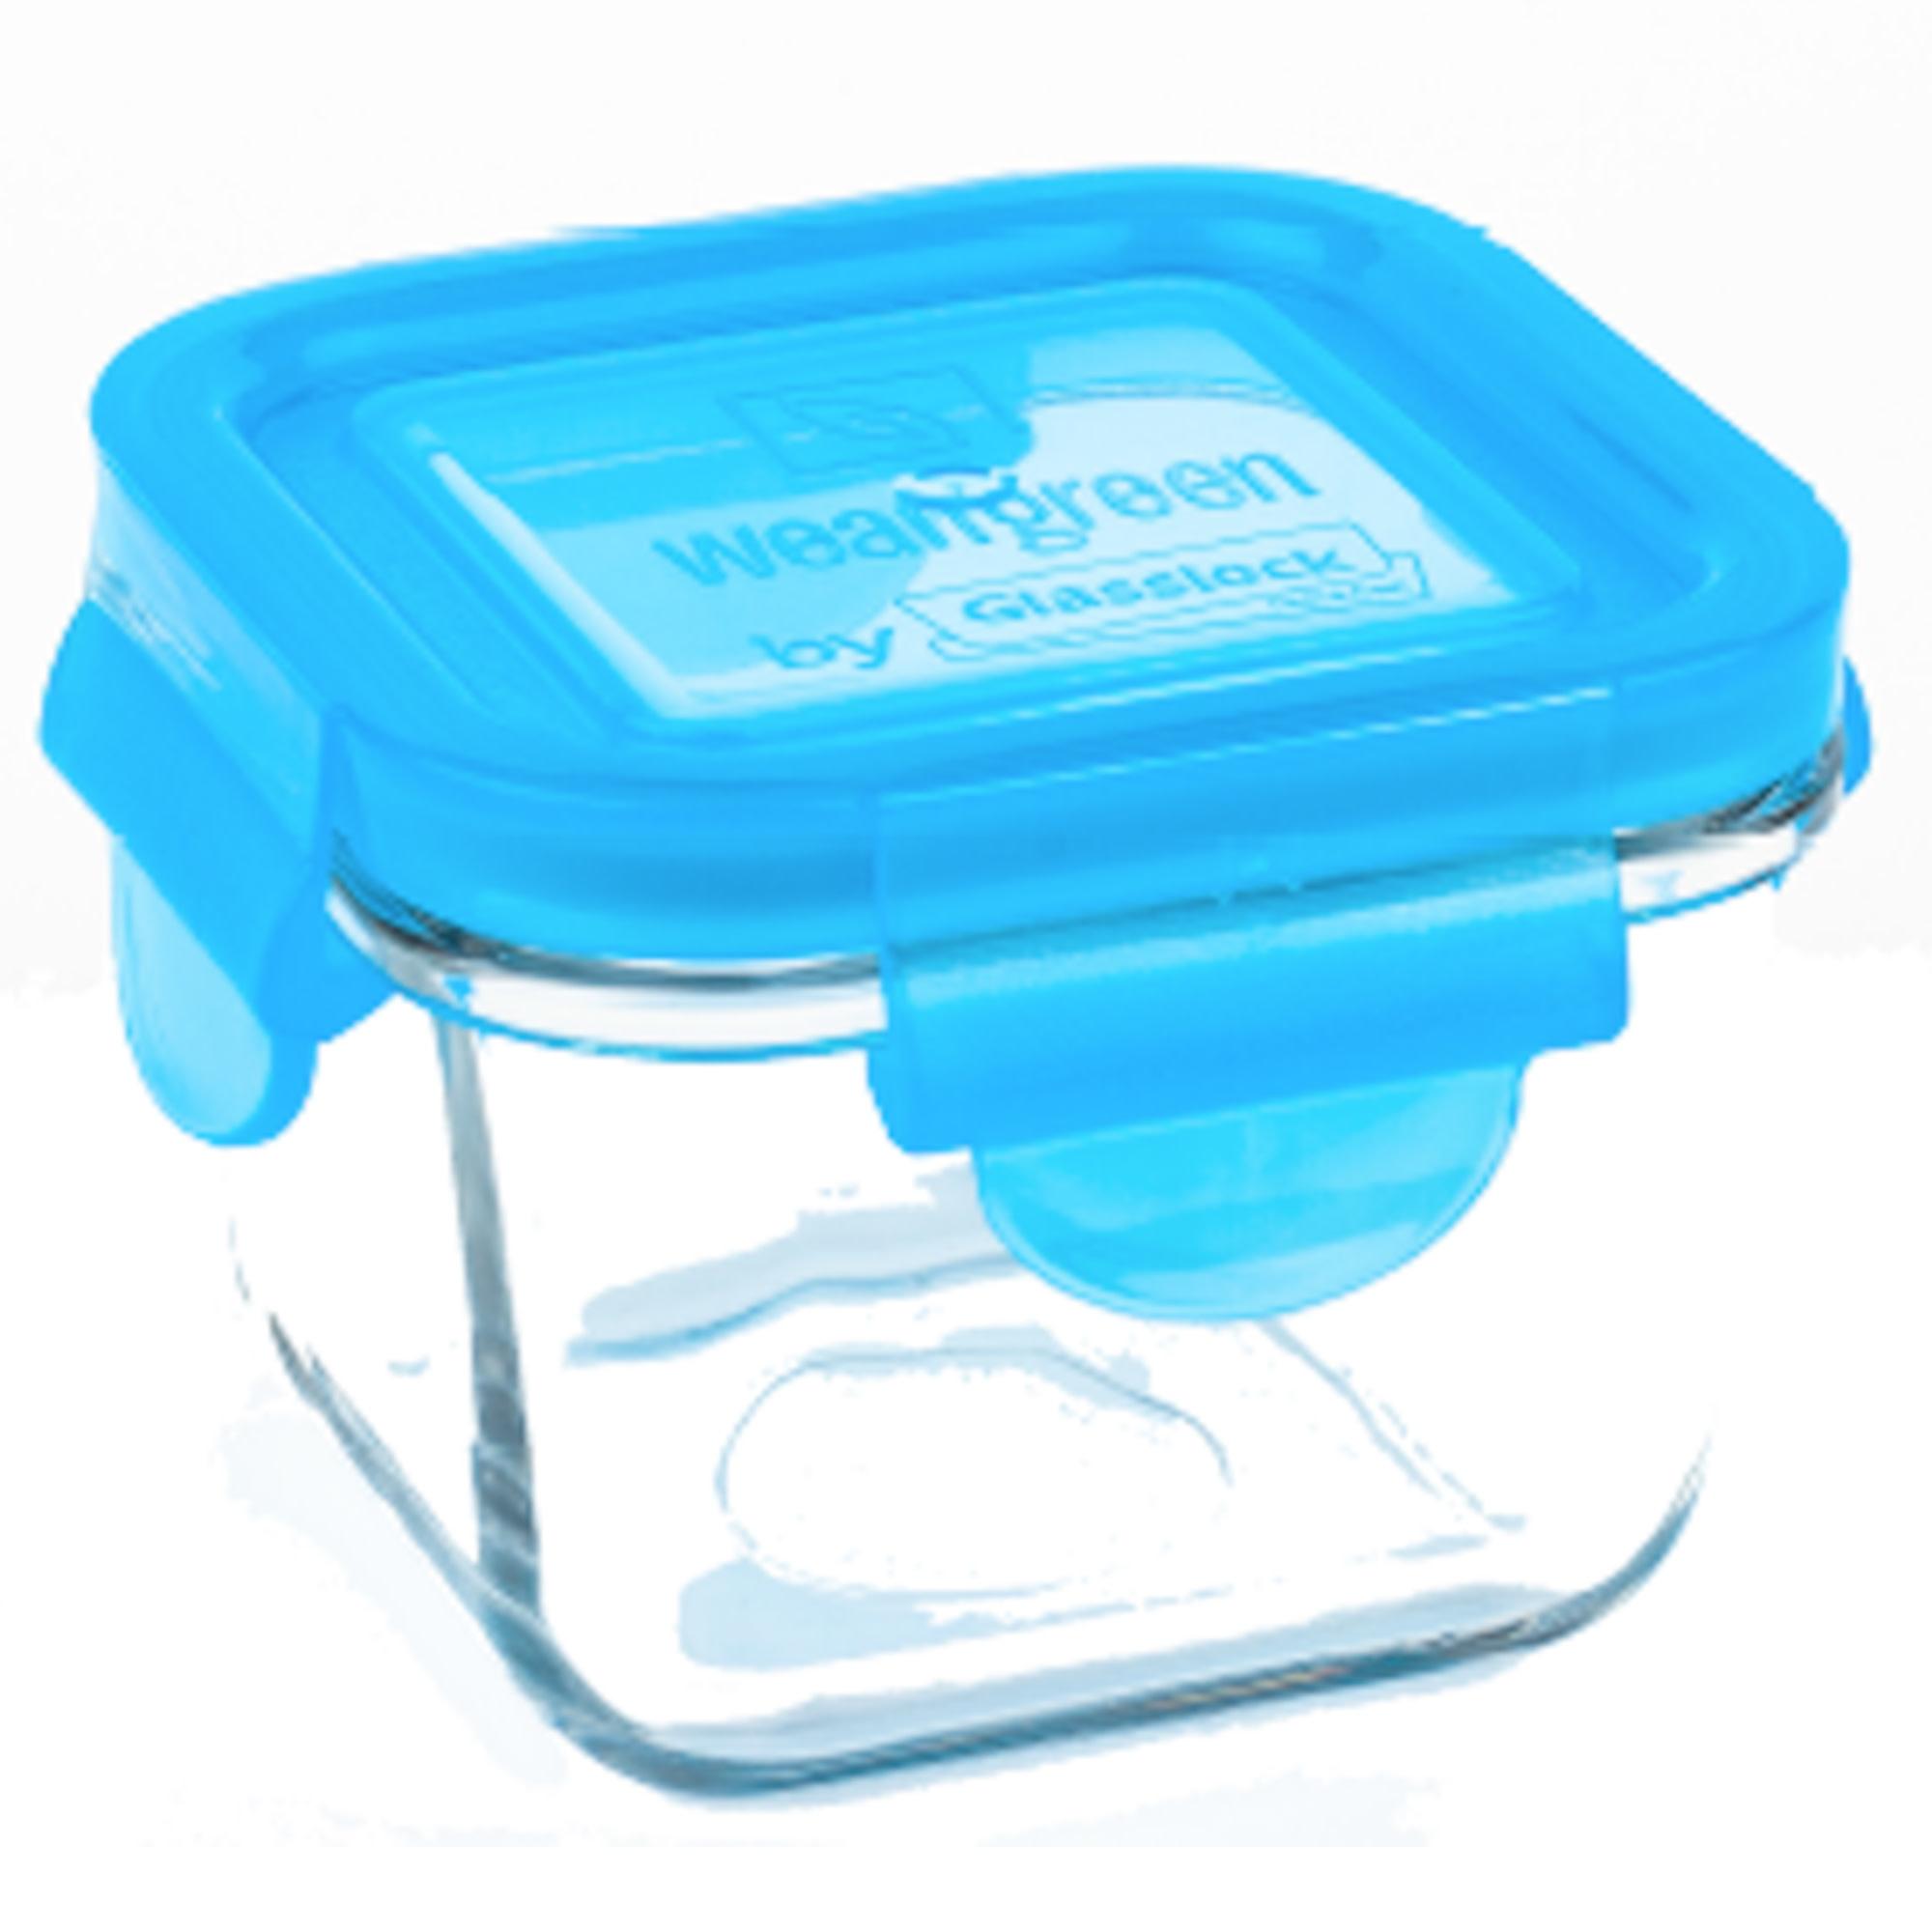 Wean Green 7 oz. Snack Cube - Blue